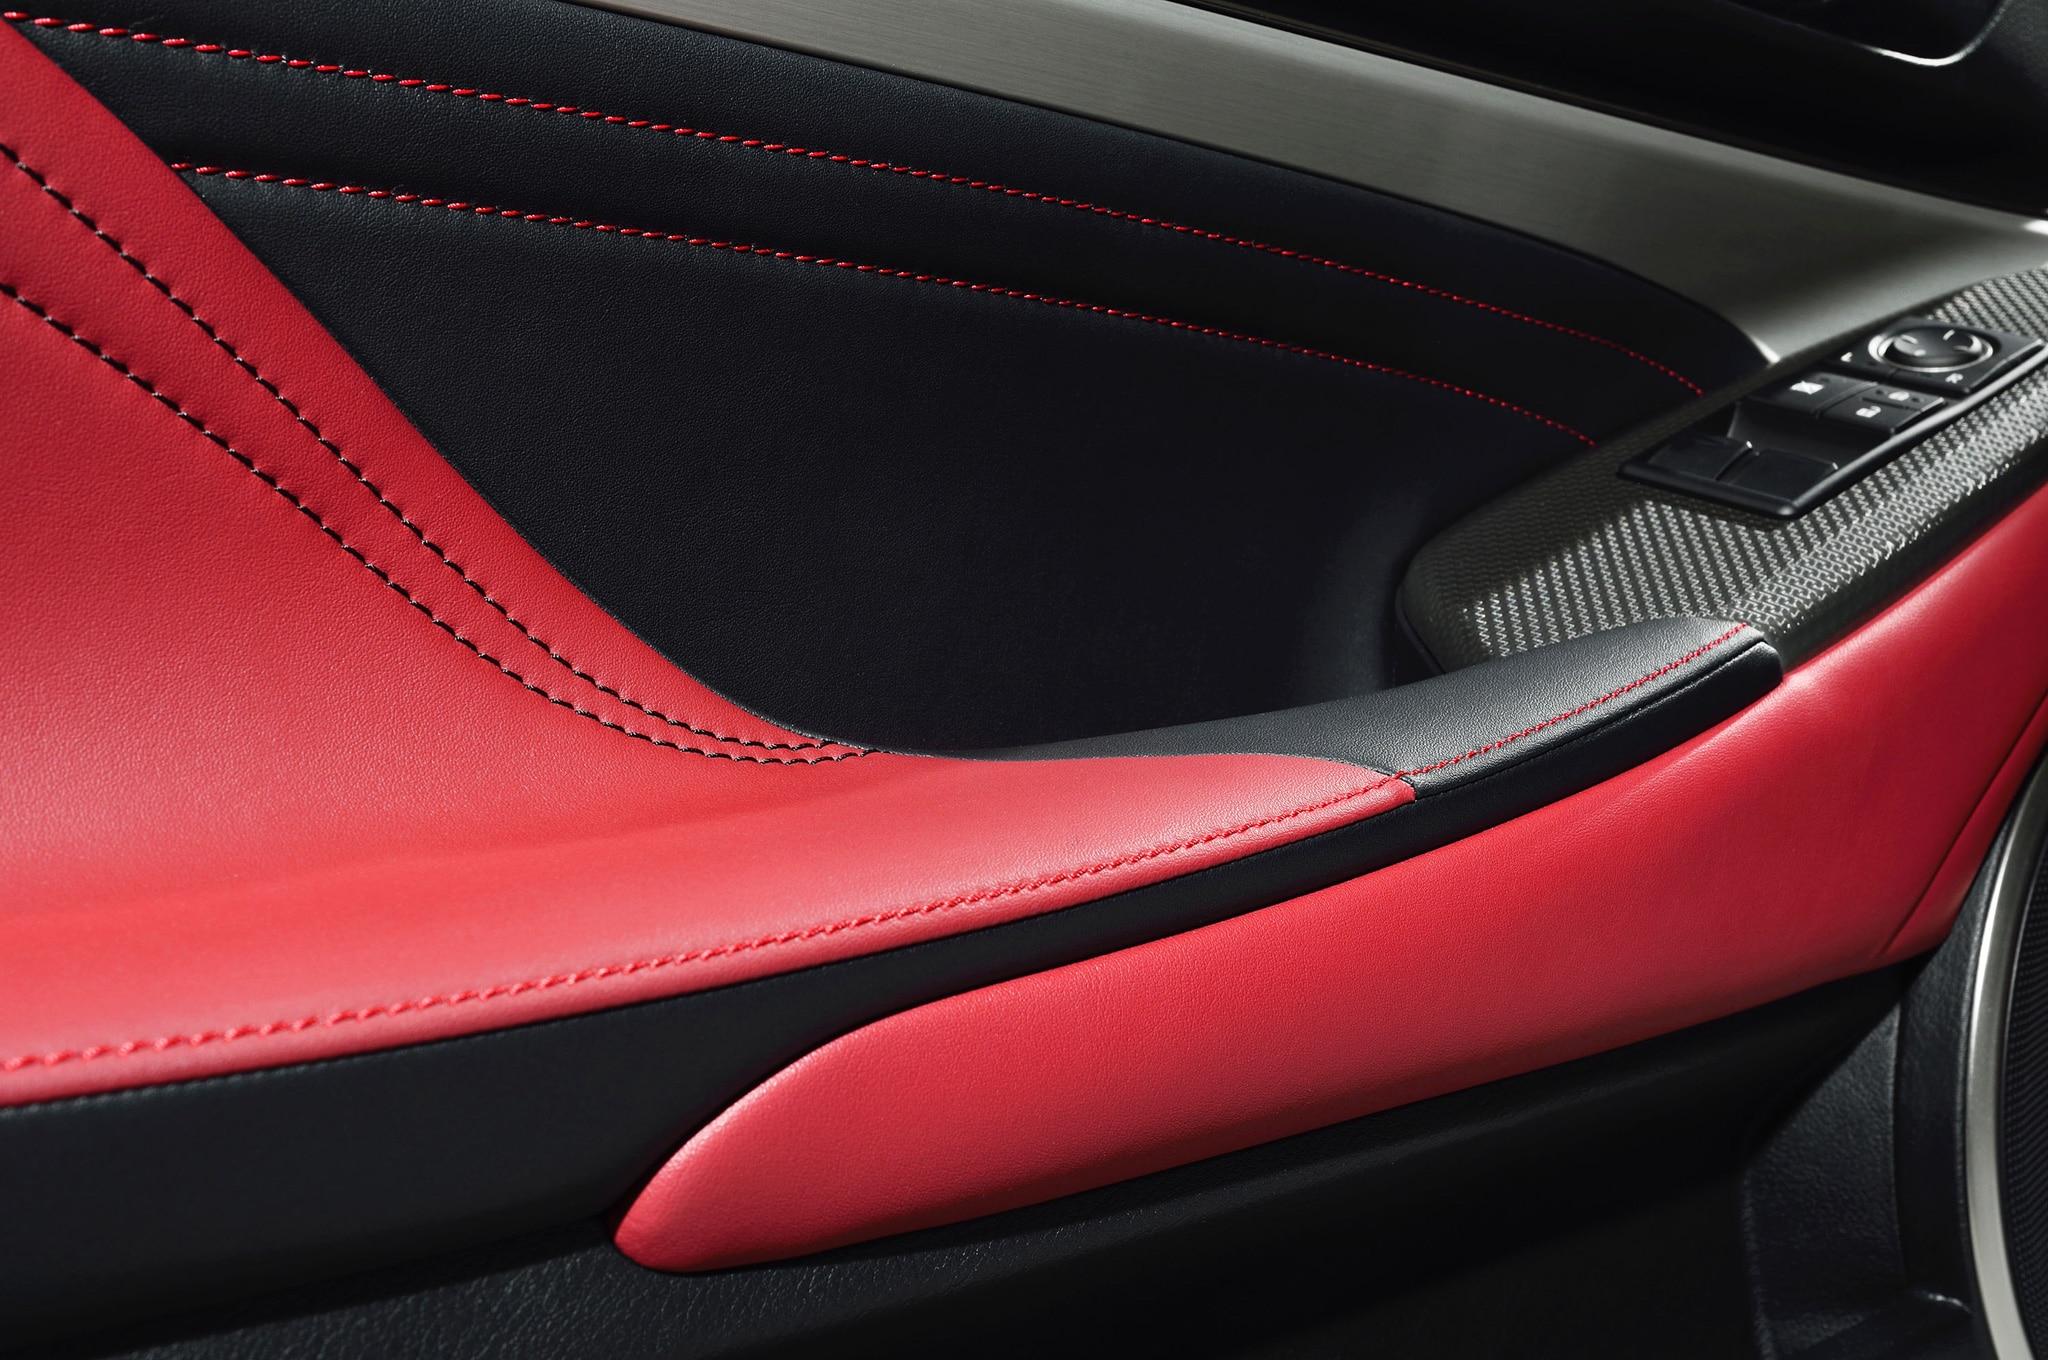 2015 lexus rc350 f sport rc f race car debut in geneva automobile for Lexus rx 350 f sport red interior